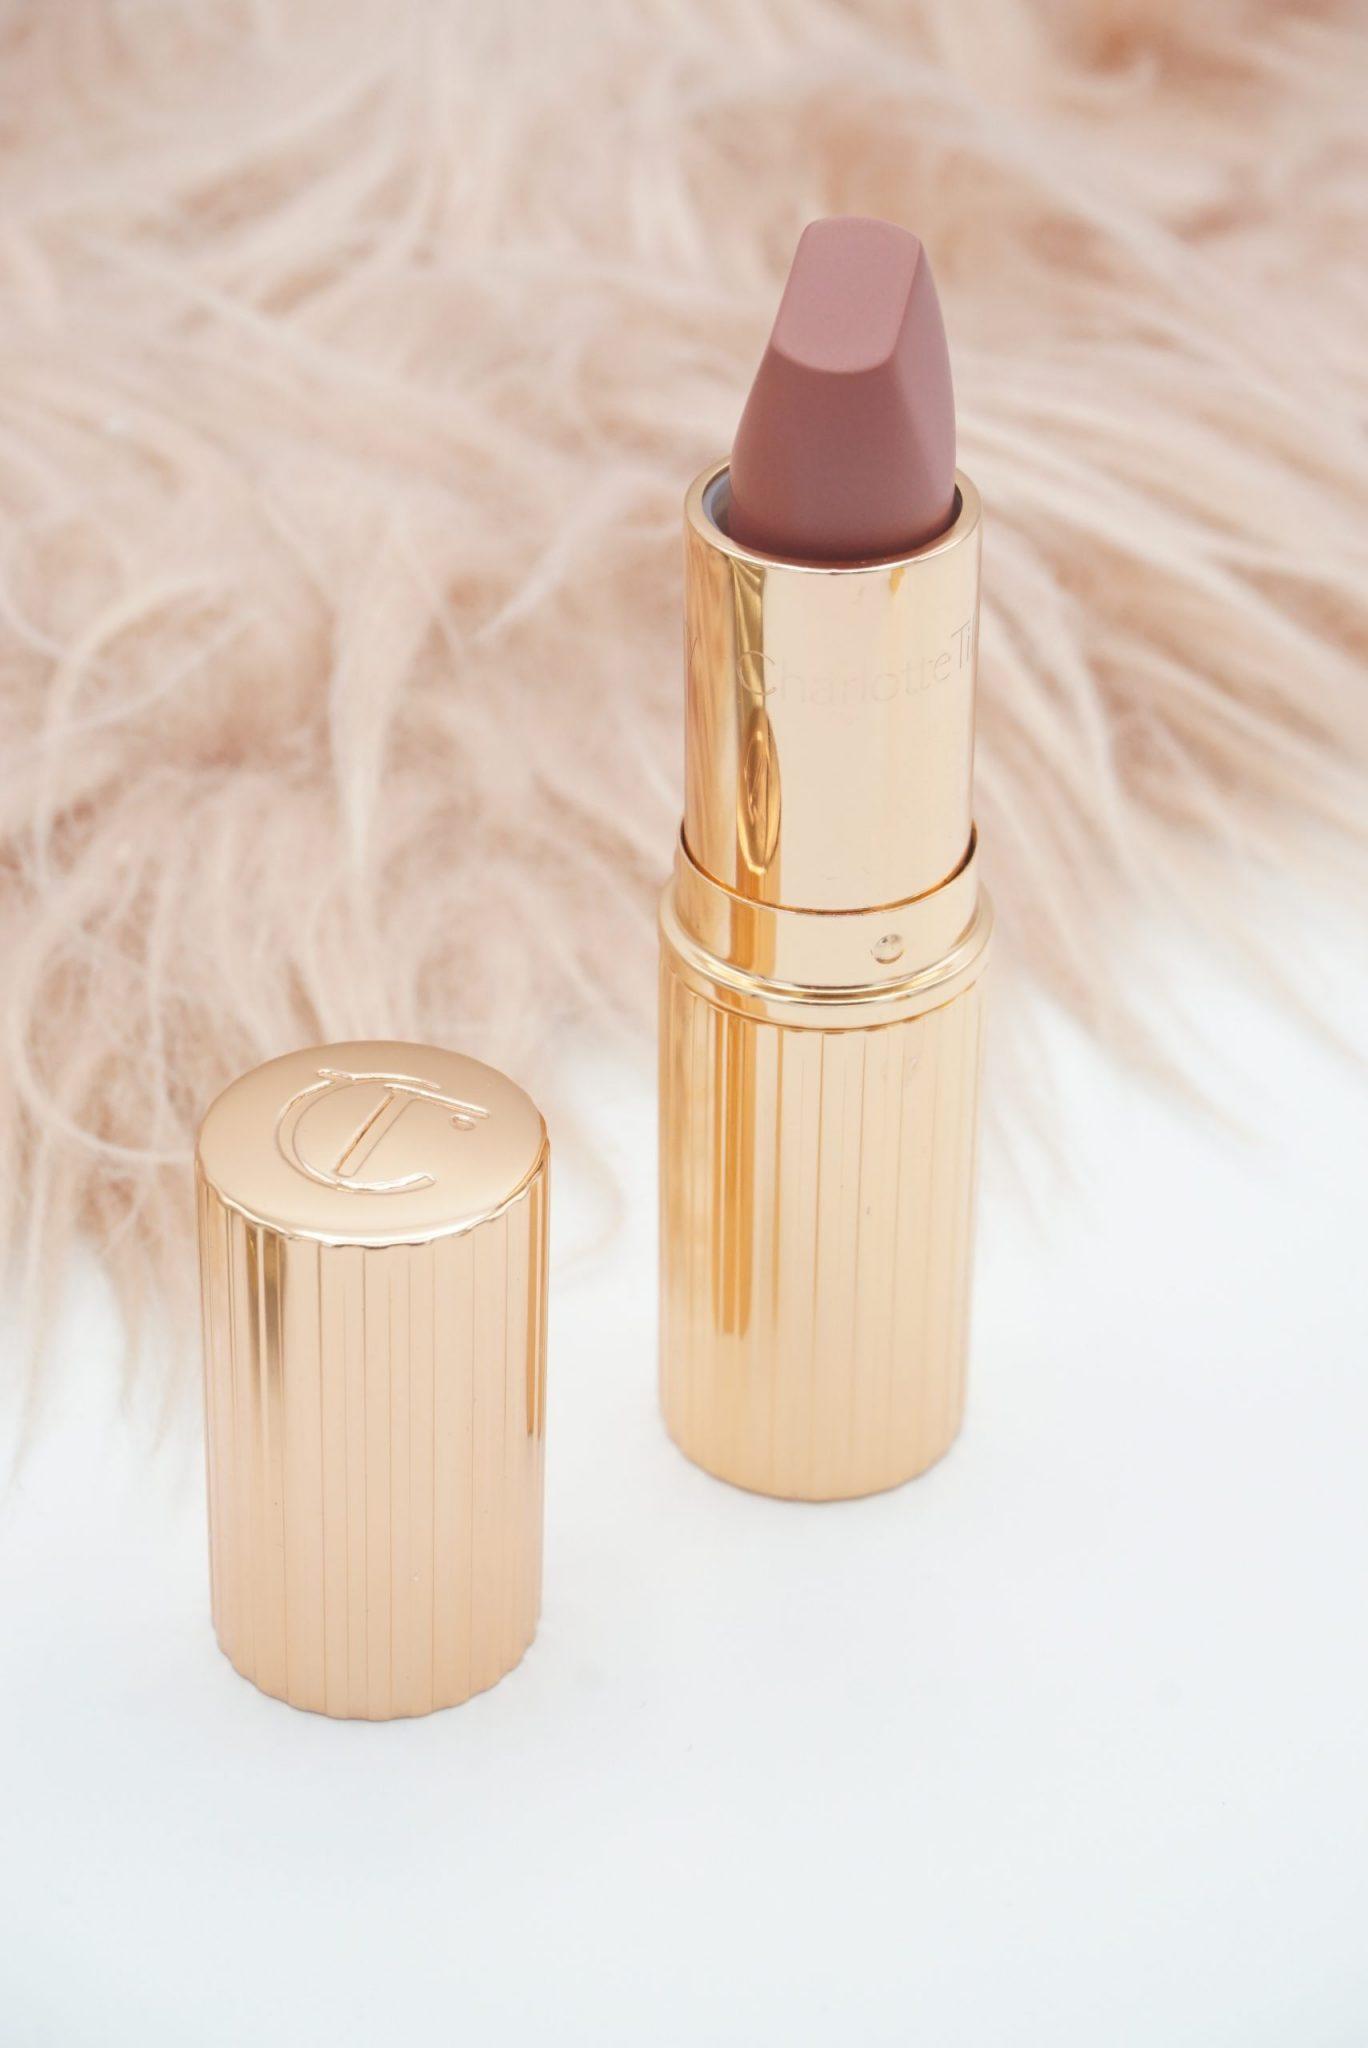 The 5 Best Nude Lipsticks For Fair Skin ⋆ Beautymone